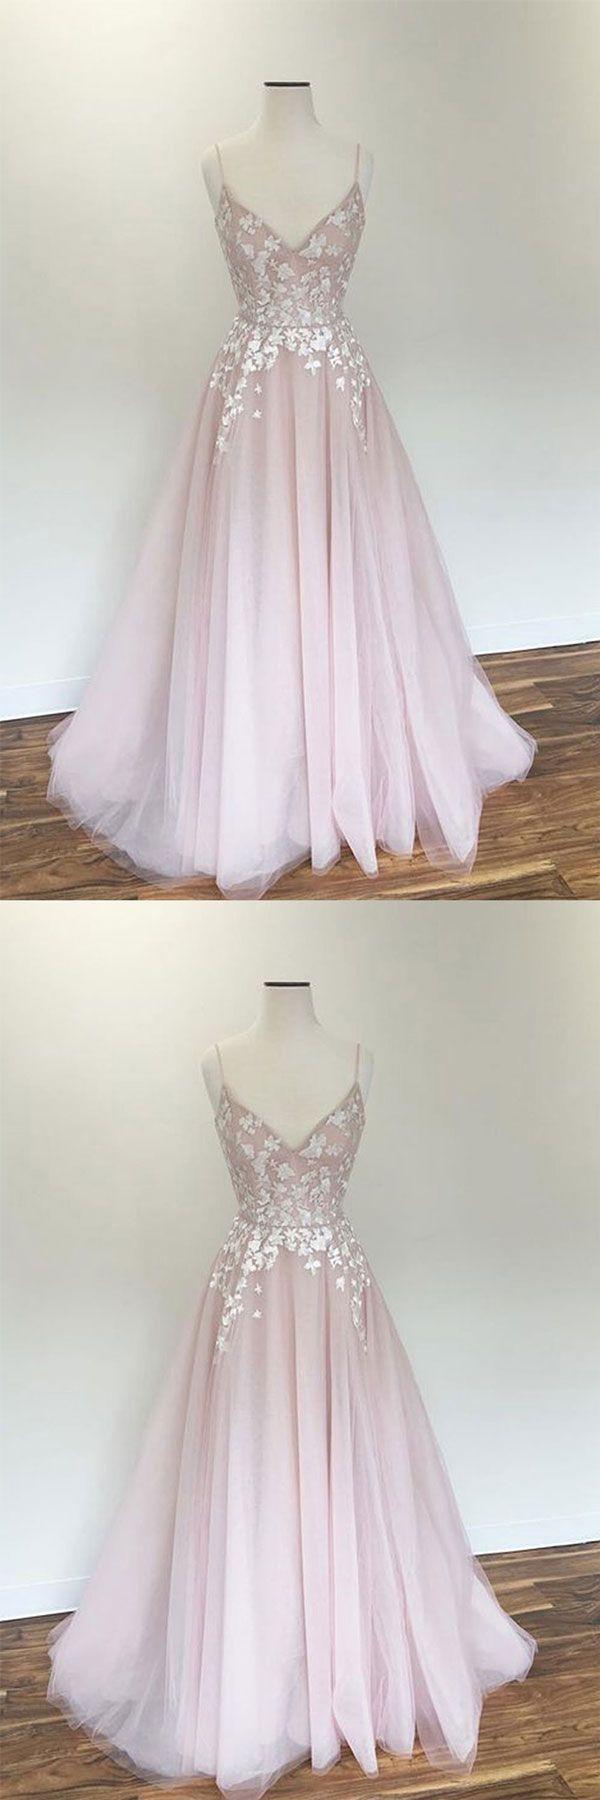 Makeup with light pink dress   best cool wedding stuff images on Pinterest  Hair ideas Hair